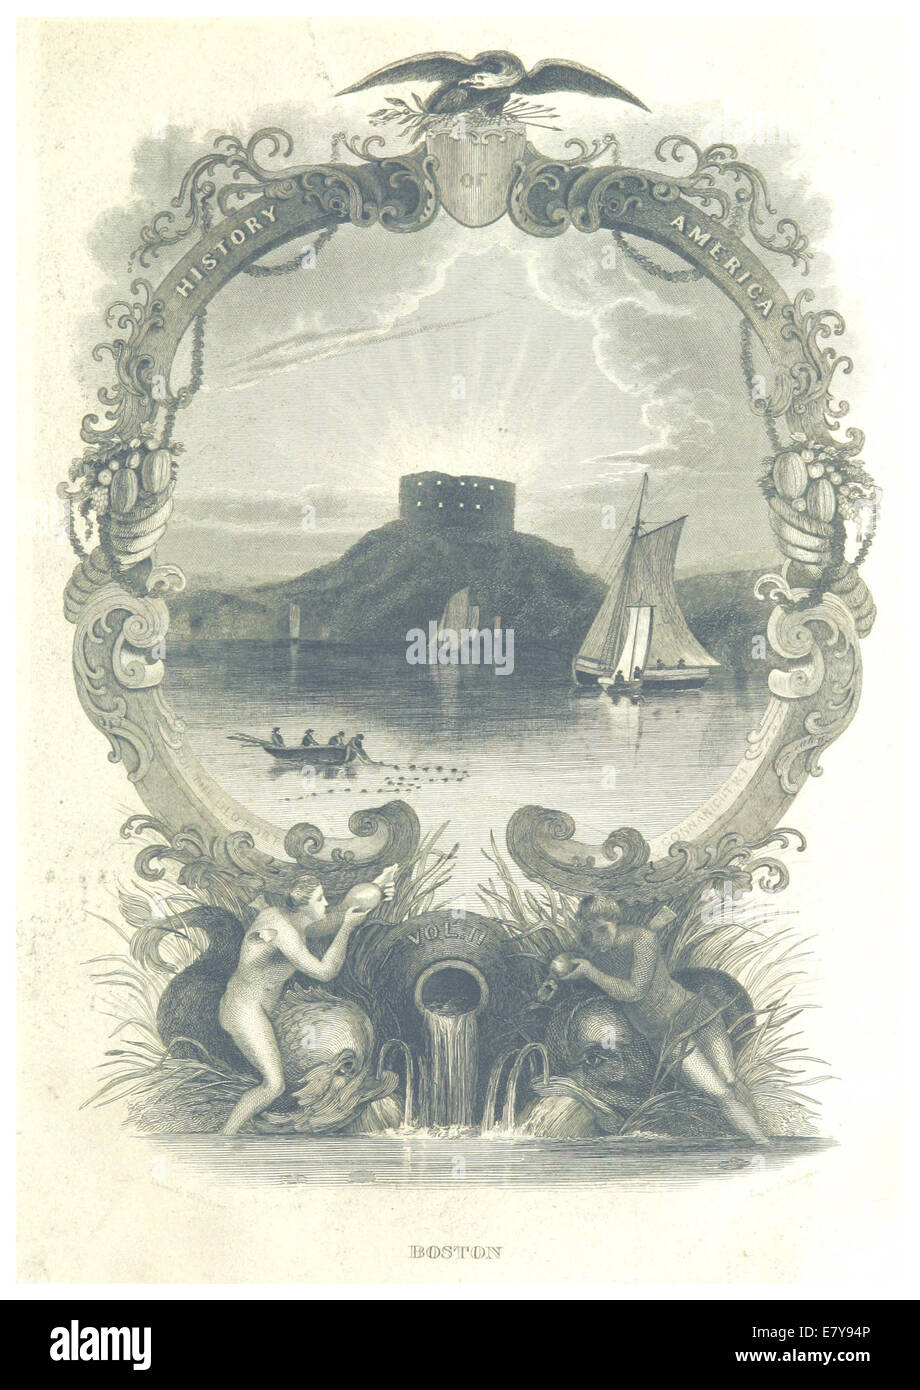 HINTON(1834) 2.011 Illustration - Stock Image